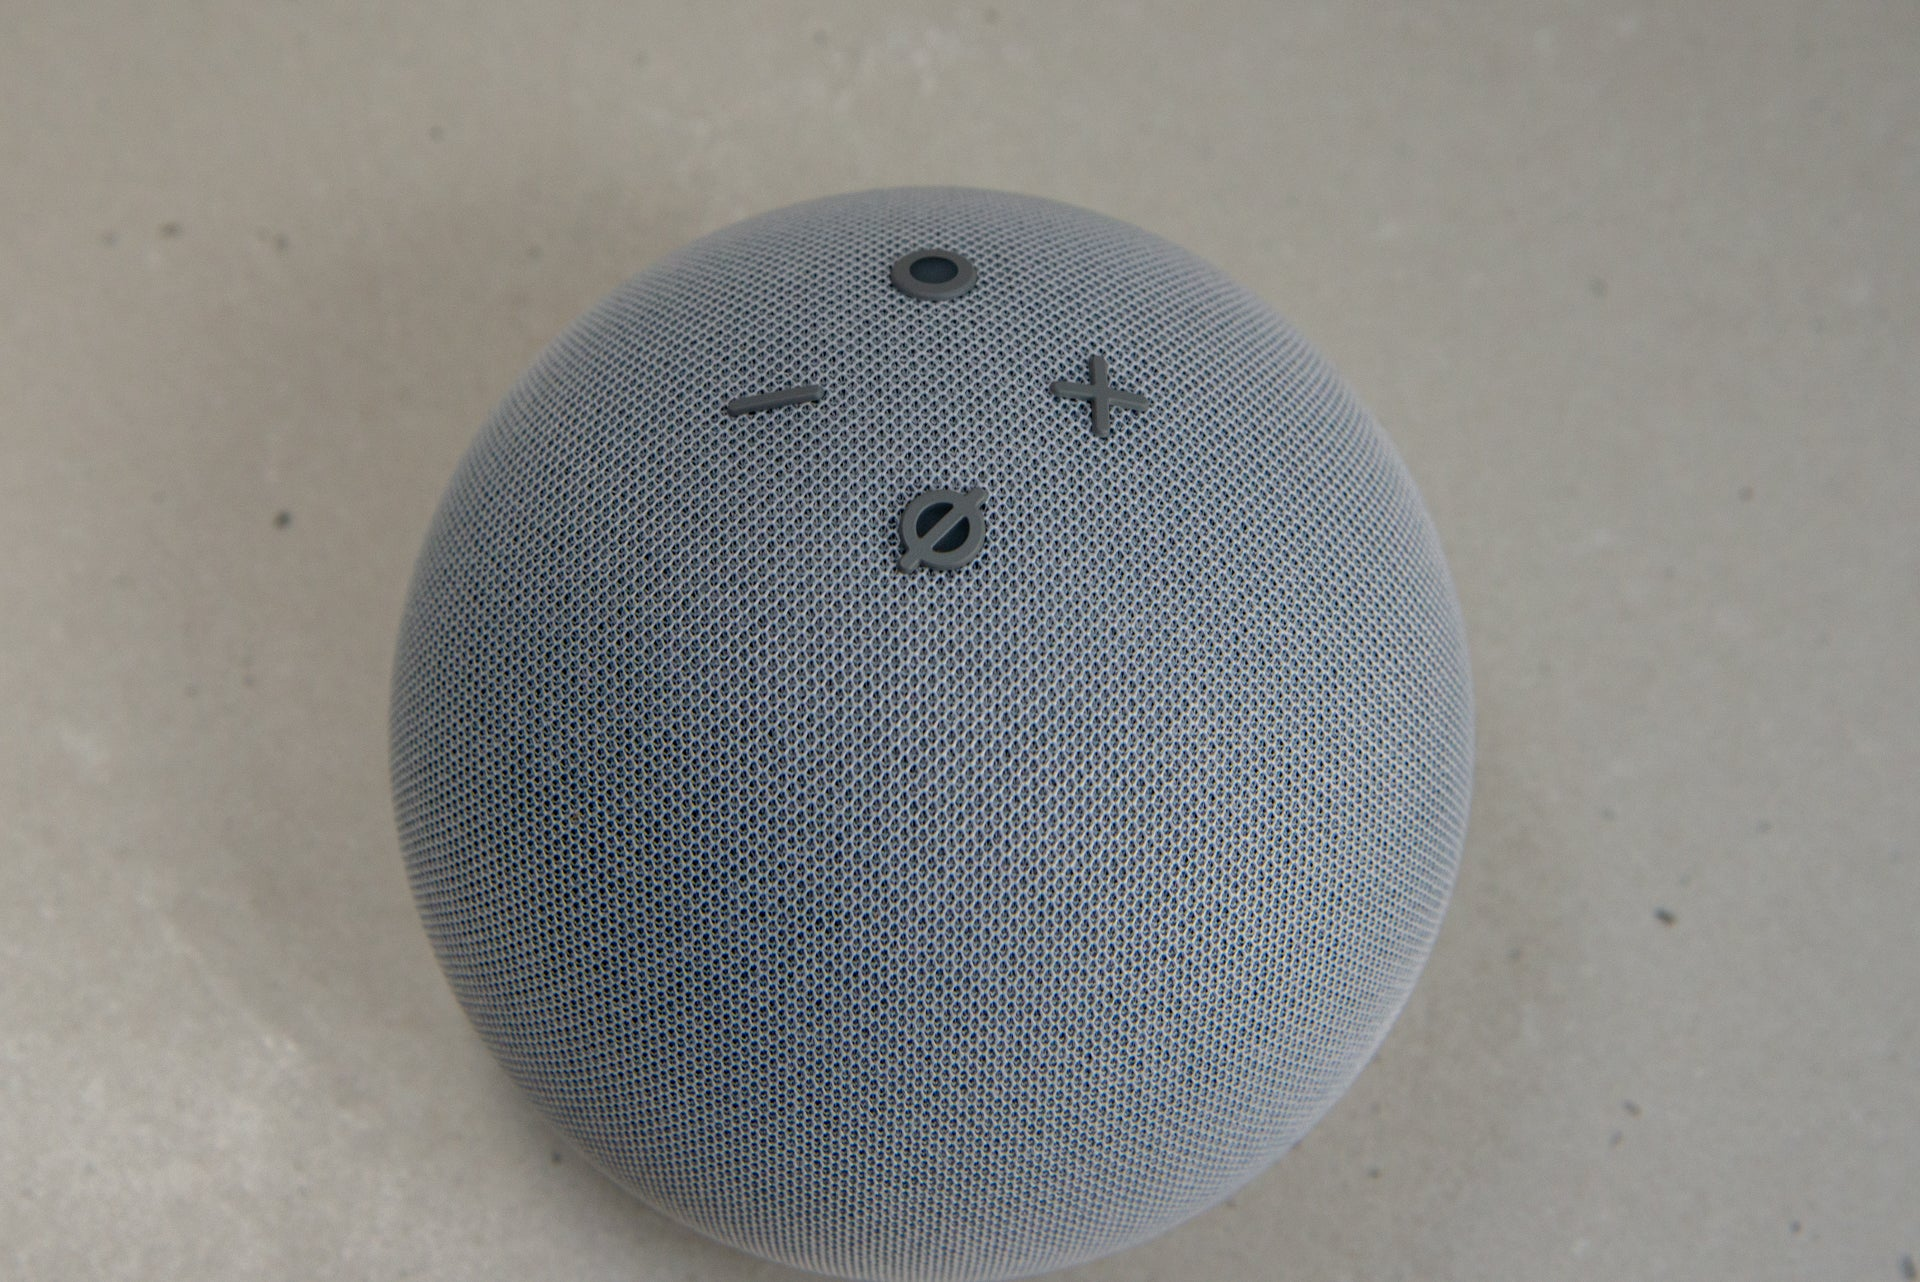 Amazon Echo Dot with Clock (4th Generation) controls